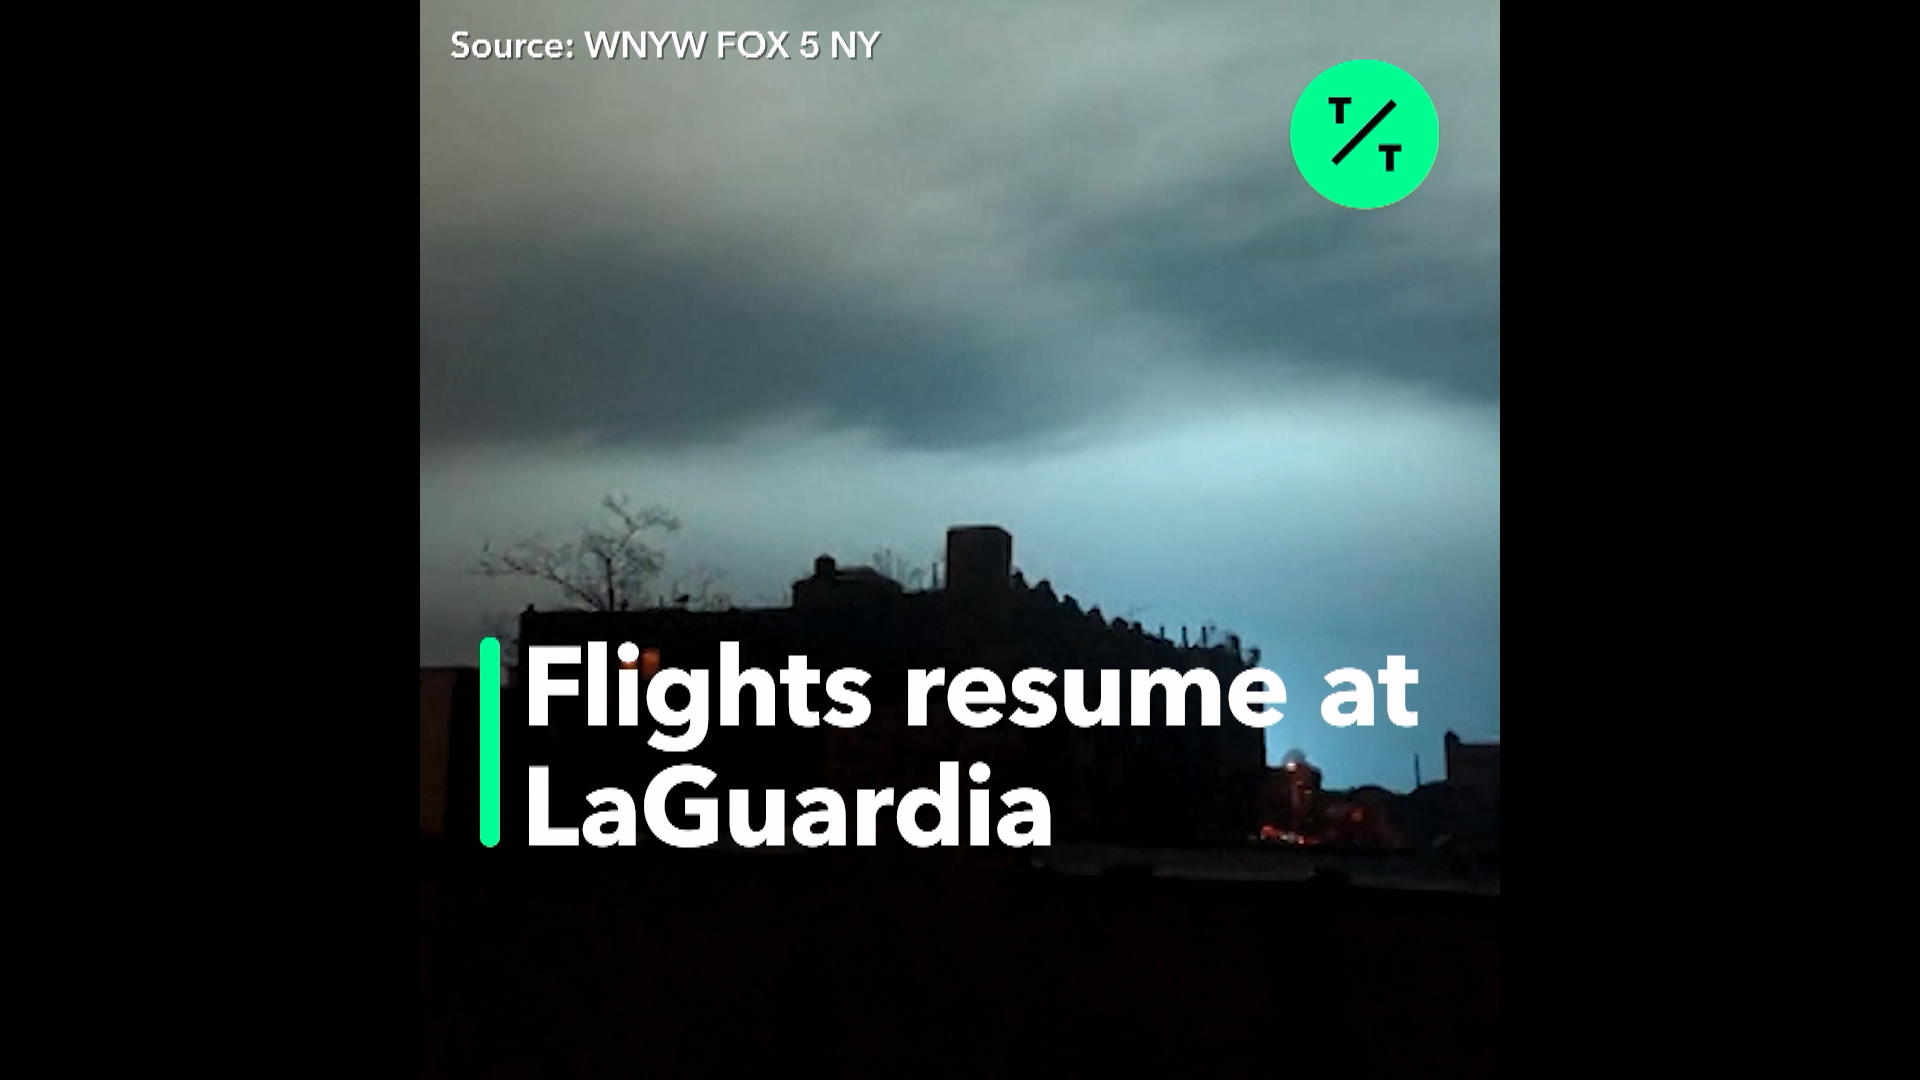 LaGuardia Flights Resume After Electric Blast Turns NYC Sky